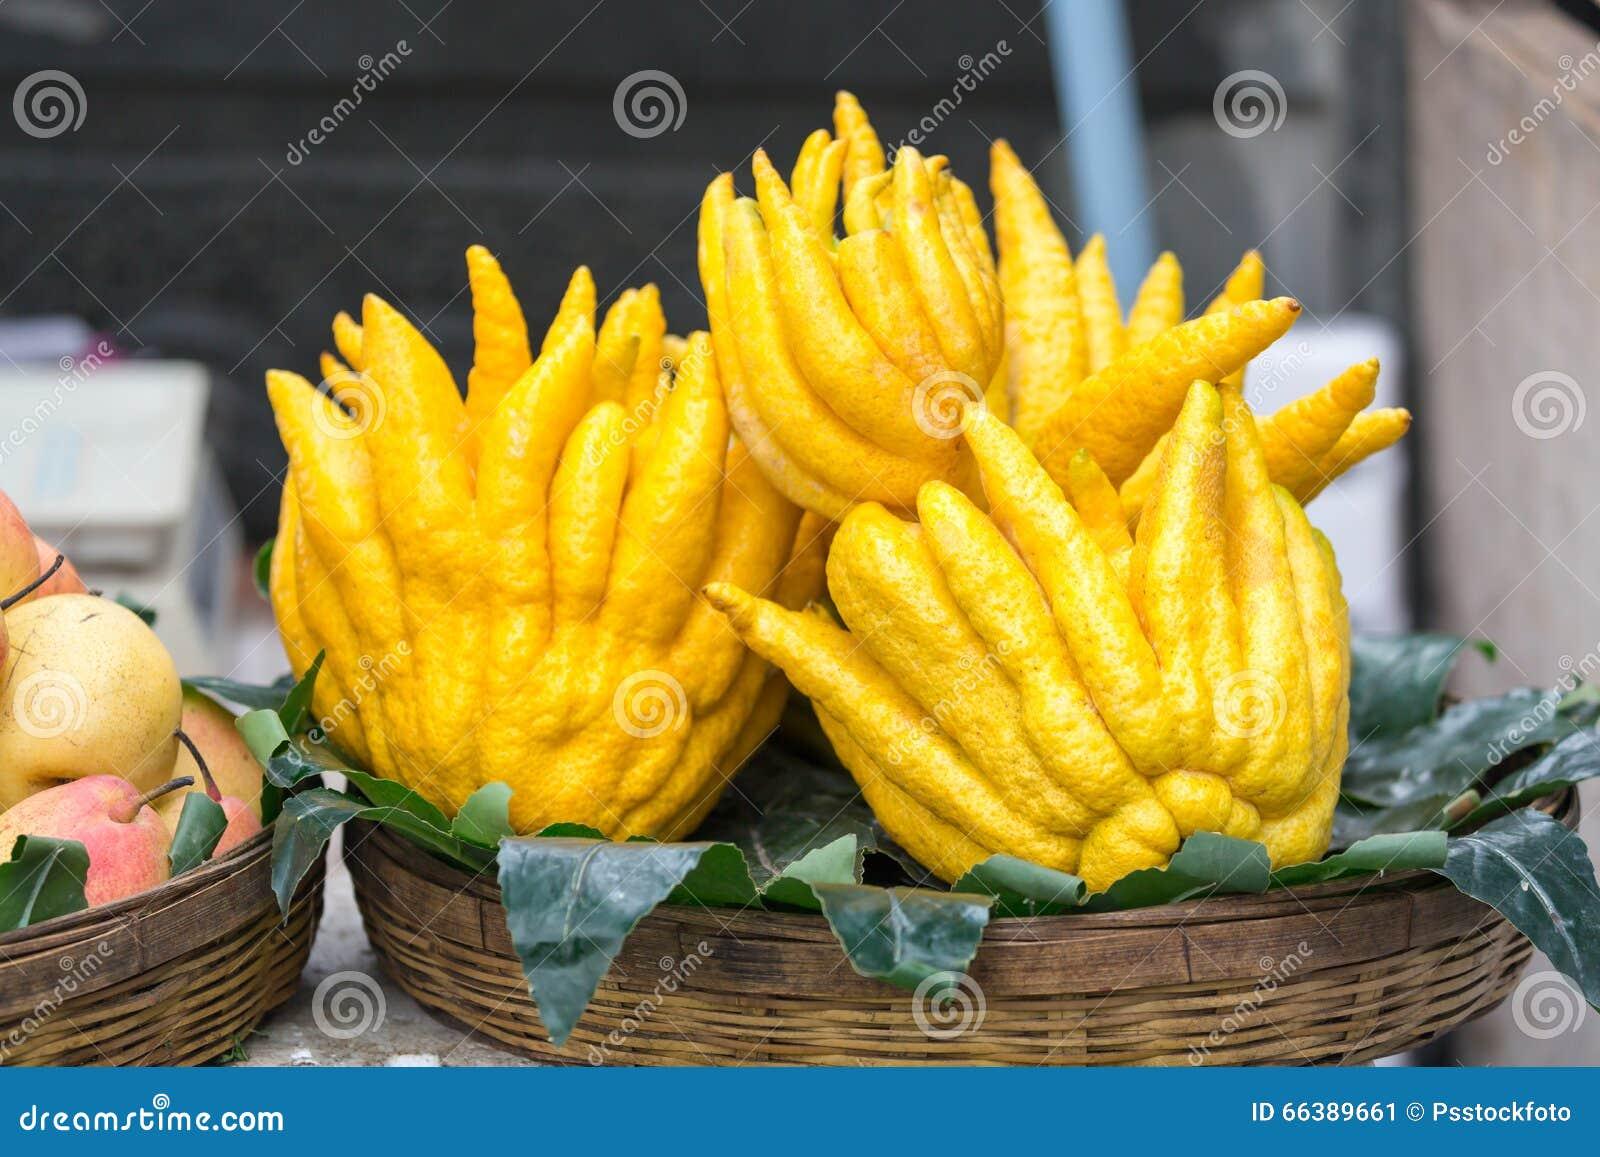 buddha hand fruit healthy fruit pie